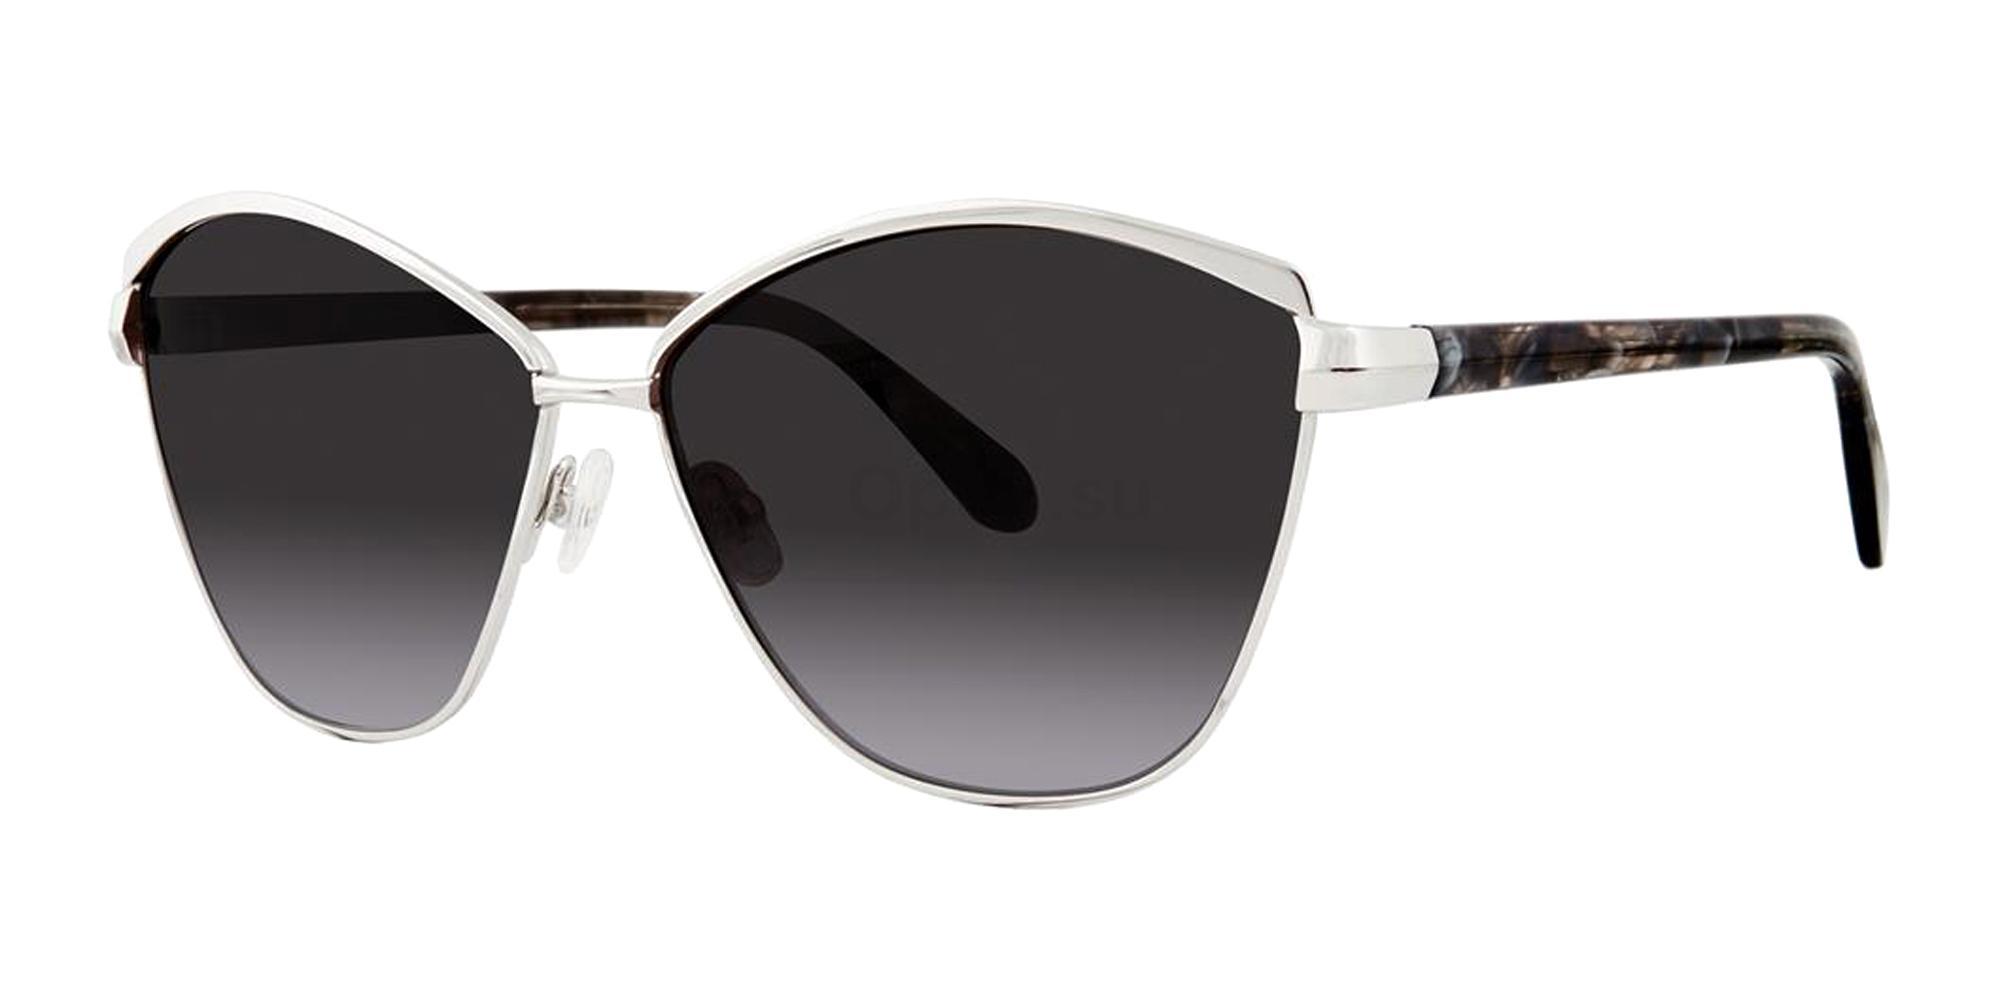 Silver VANINA Sunglasses, Zac Posen